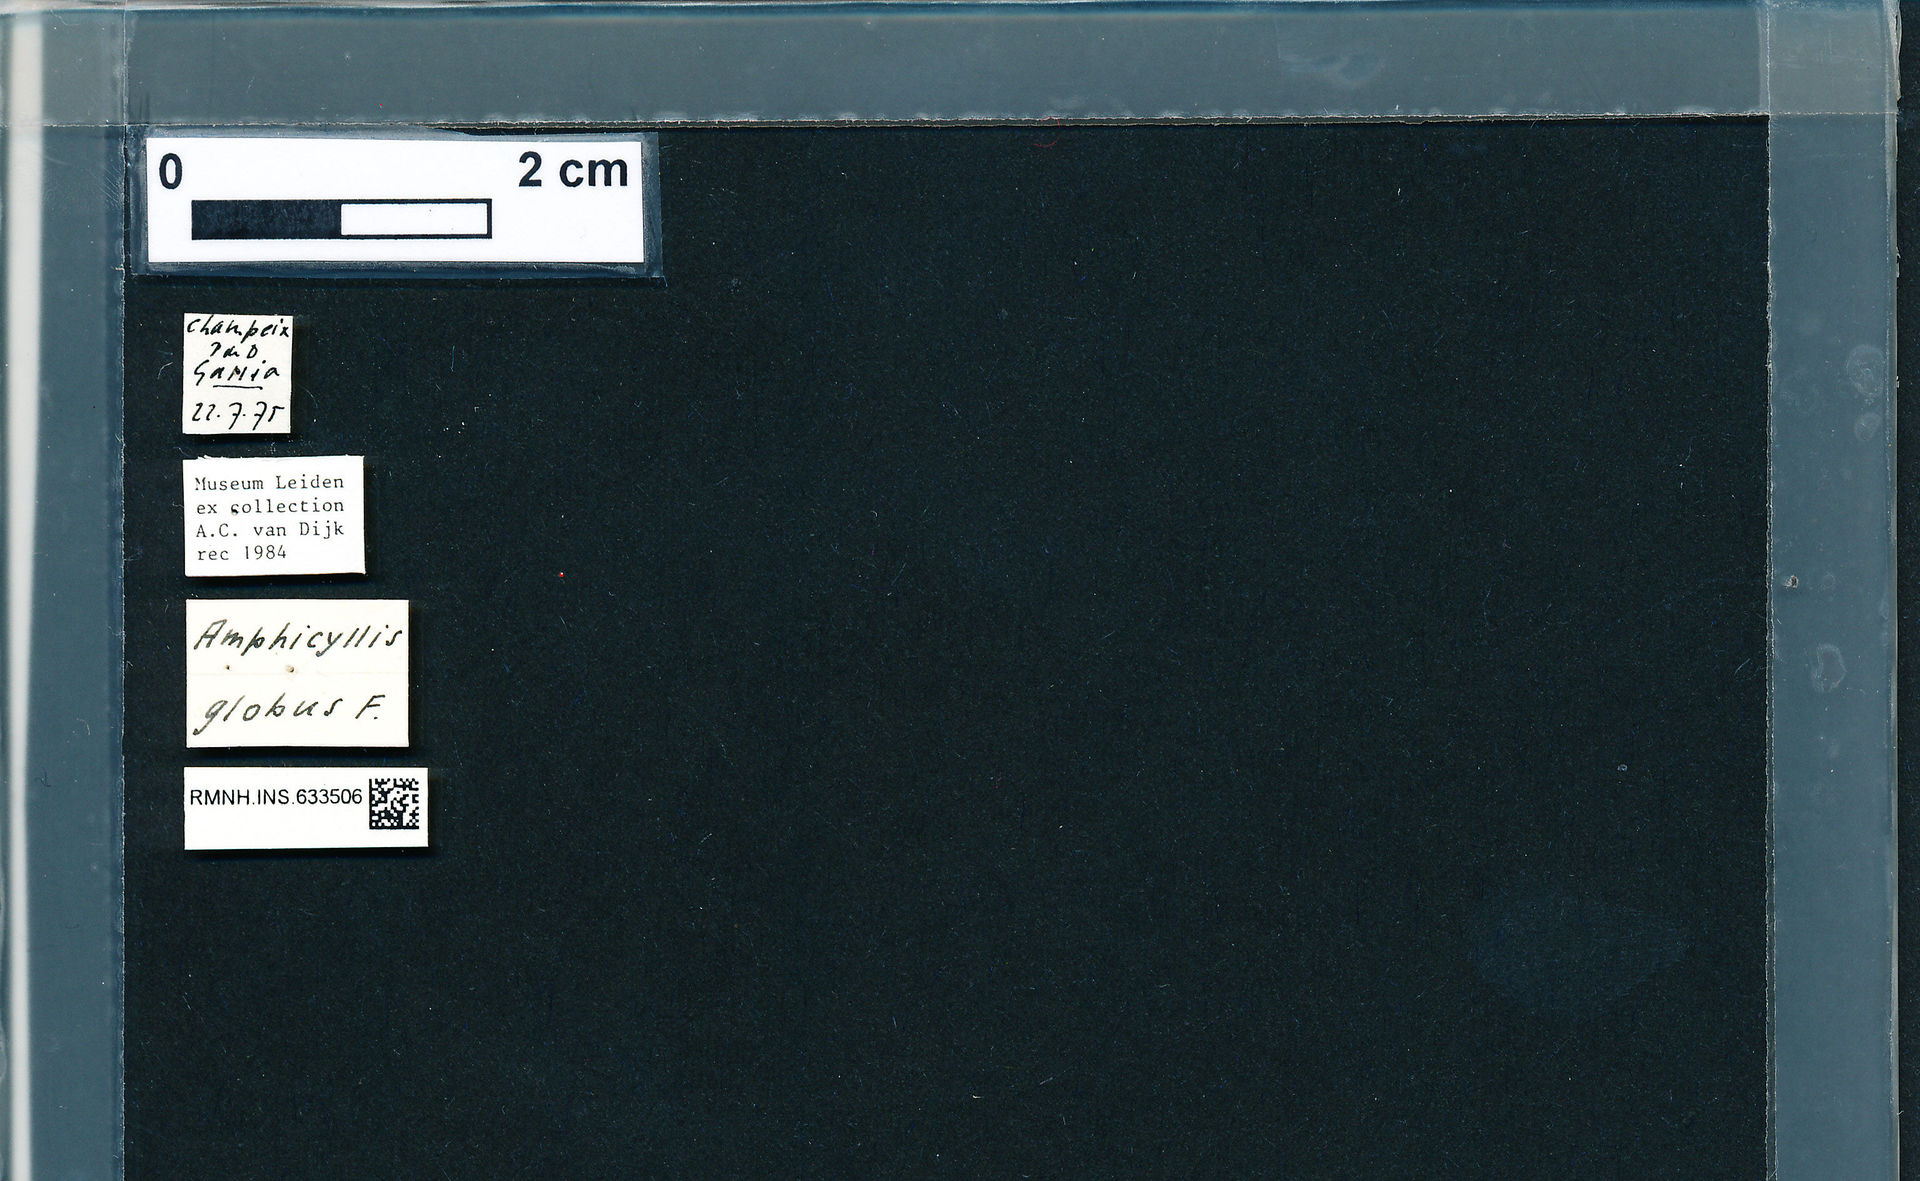 RMNH.INS.633506 | Amphicyllis globus Fab.